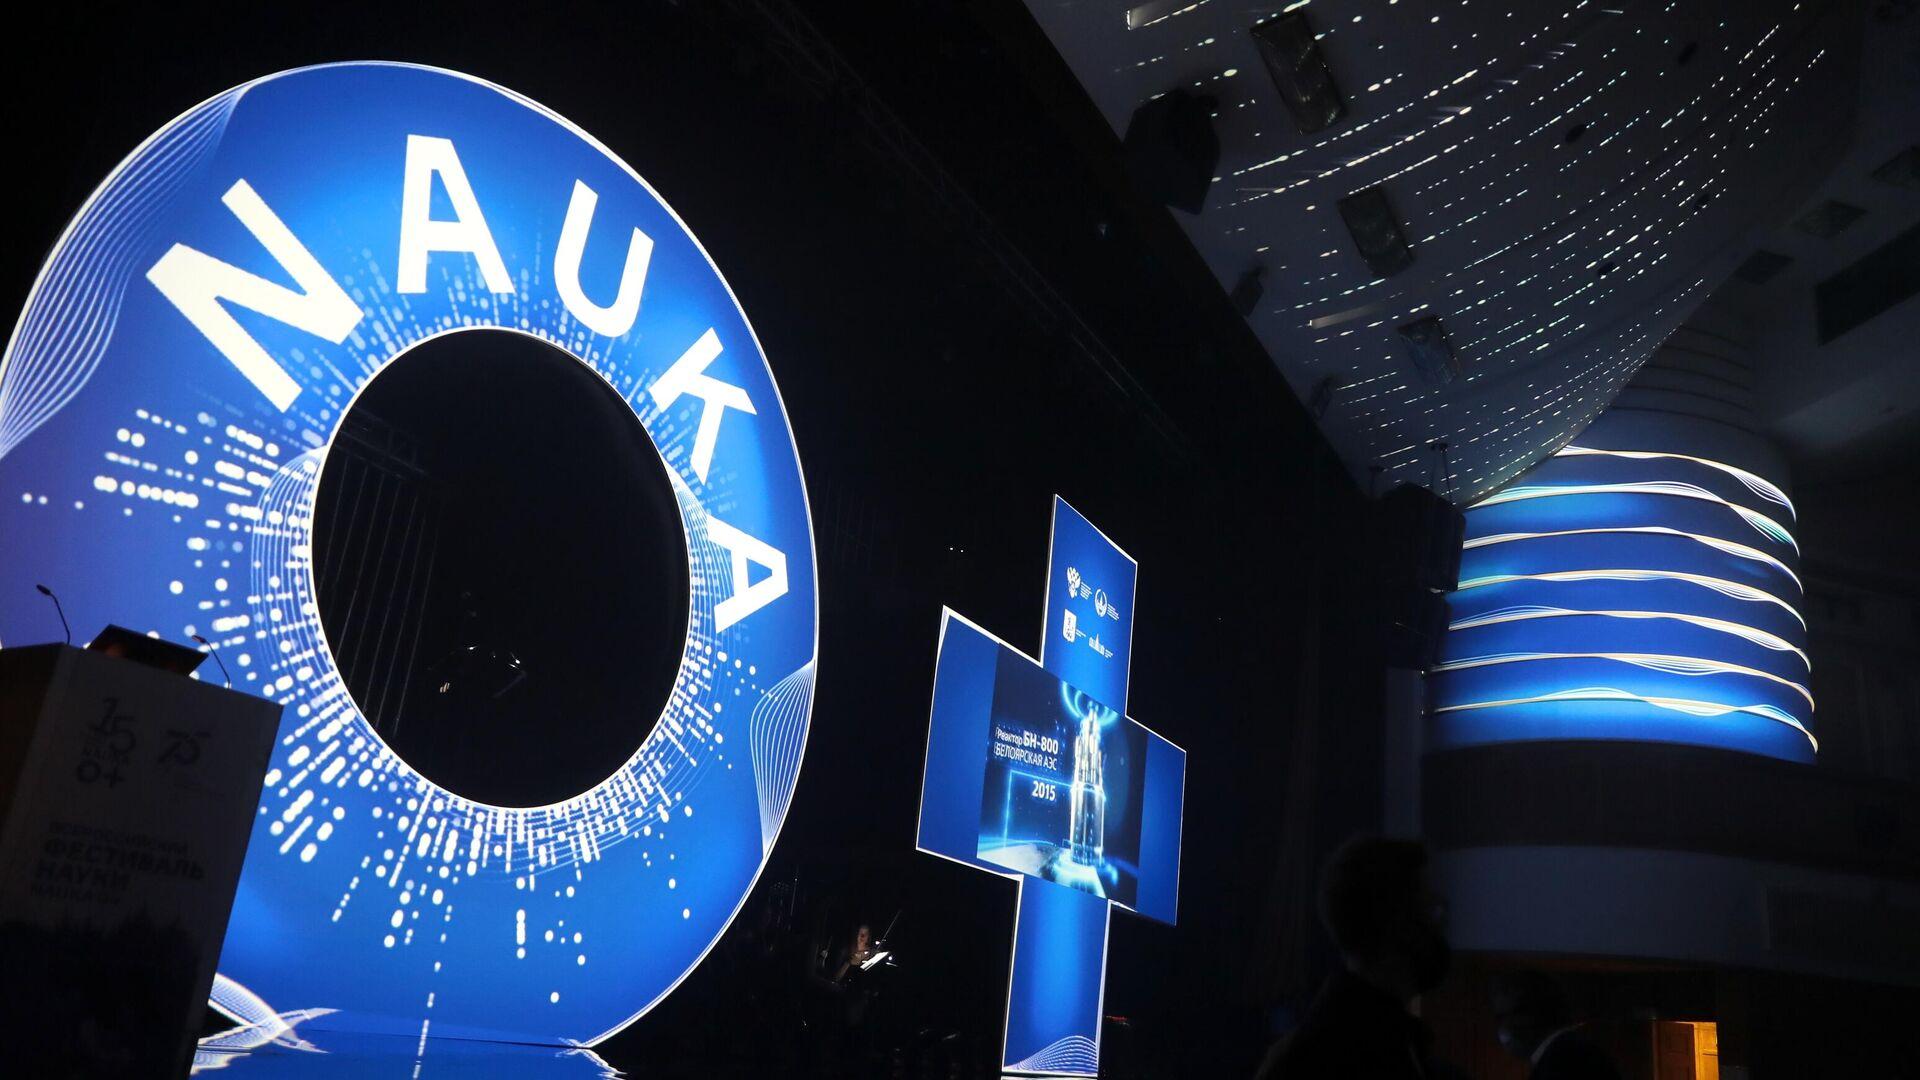 La ceremonia de apertura del festival Nauka 0+ - Sputnik Mundo, 1920, 09.10.2021